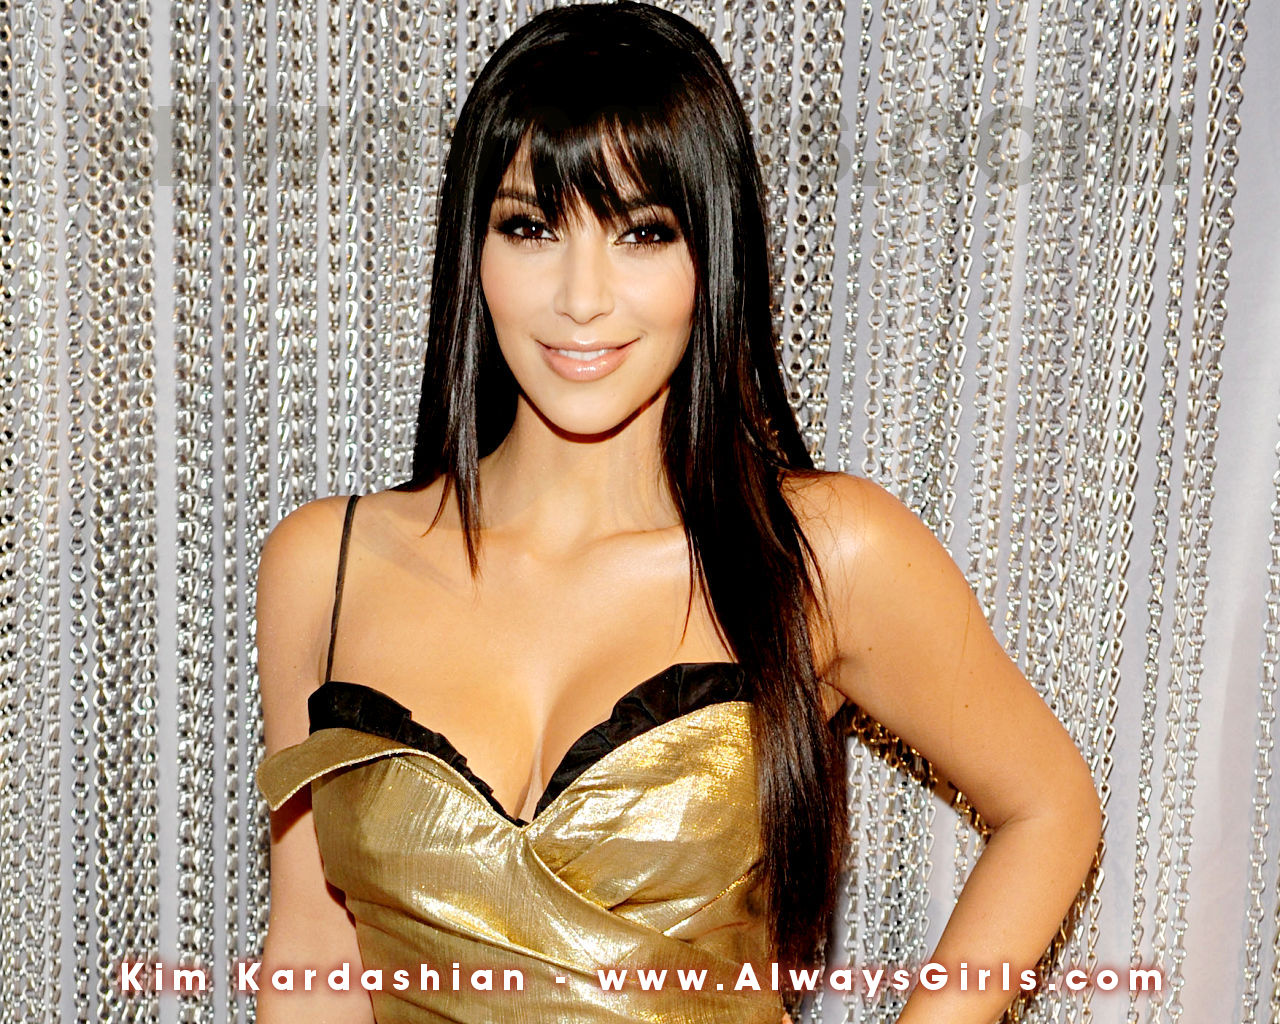 http://2.bp.blogspot.com/-37ZnDwt58mY/TZiIsceStLI/AAAAAAAAAr4/xmk2mXfPyyA/s1600/kim_kardashian02.jpg